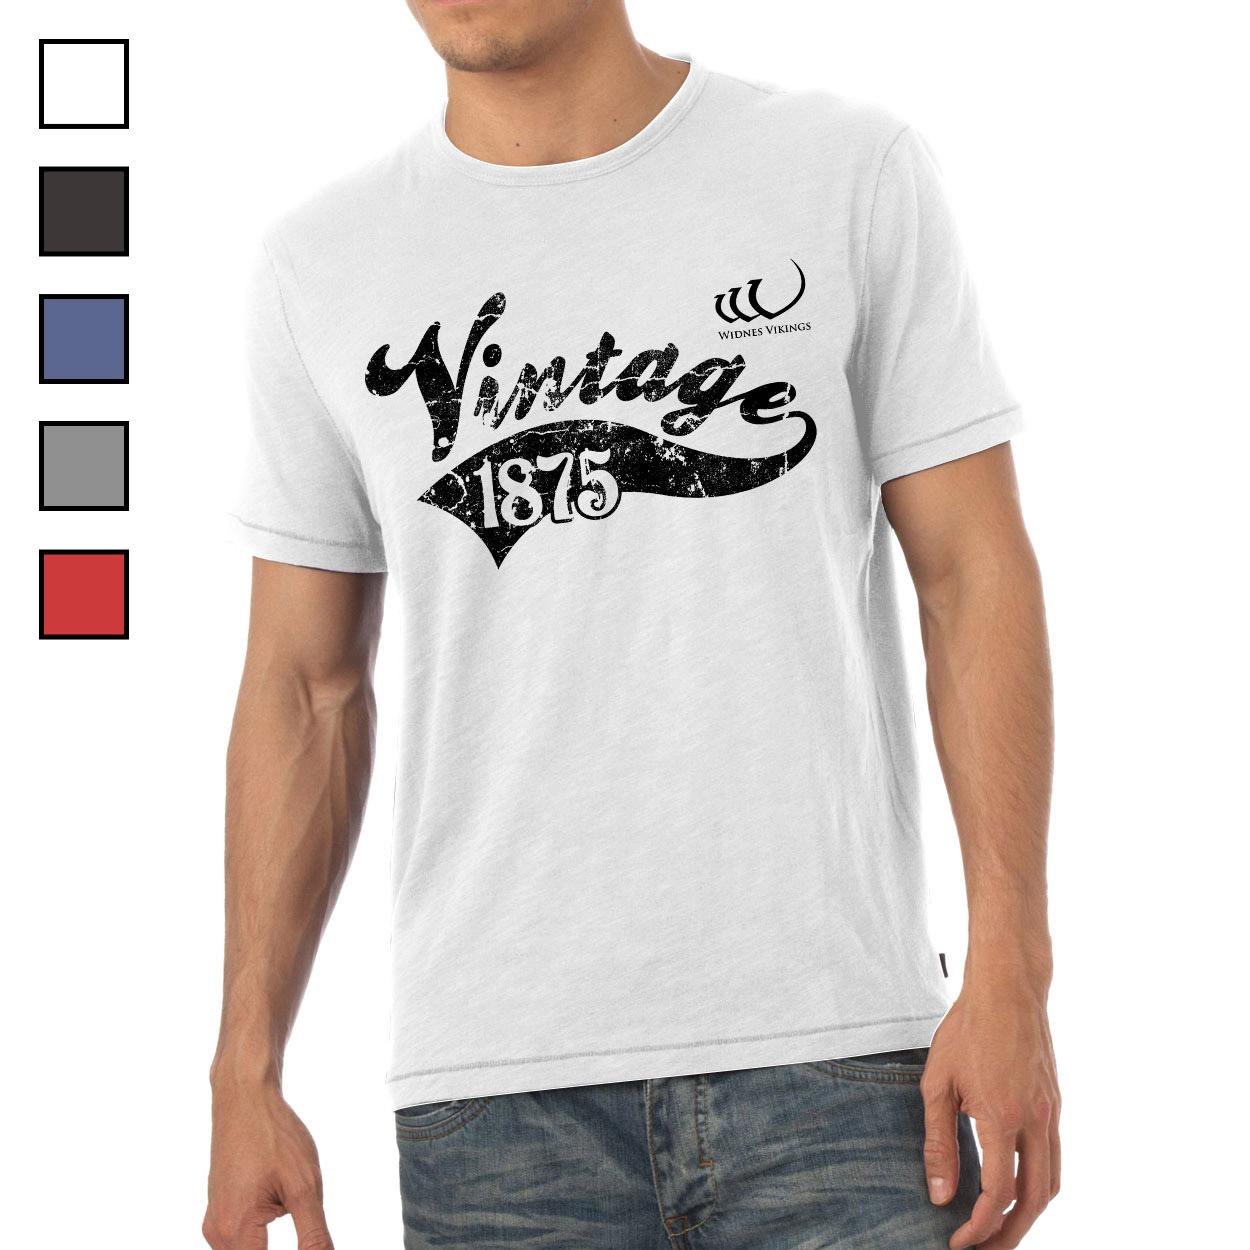 Widnes Vikings Mens Vintage T-Shirt